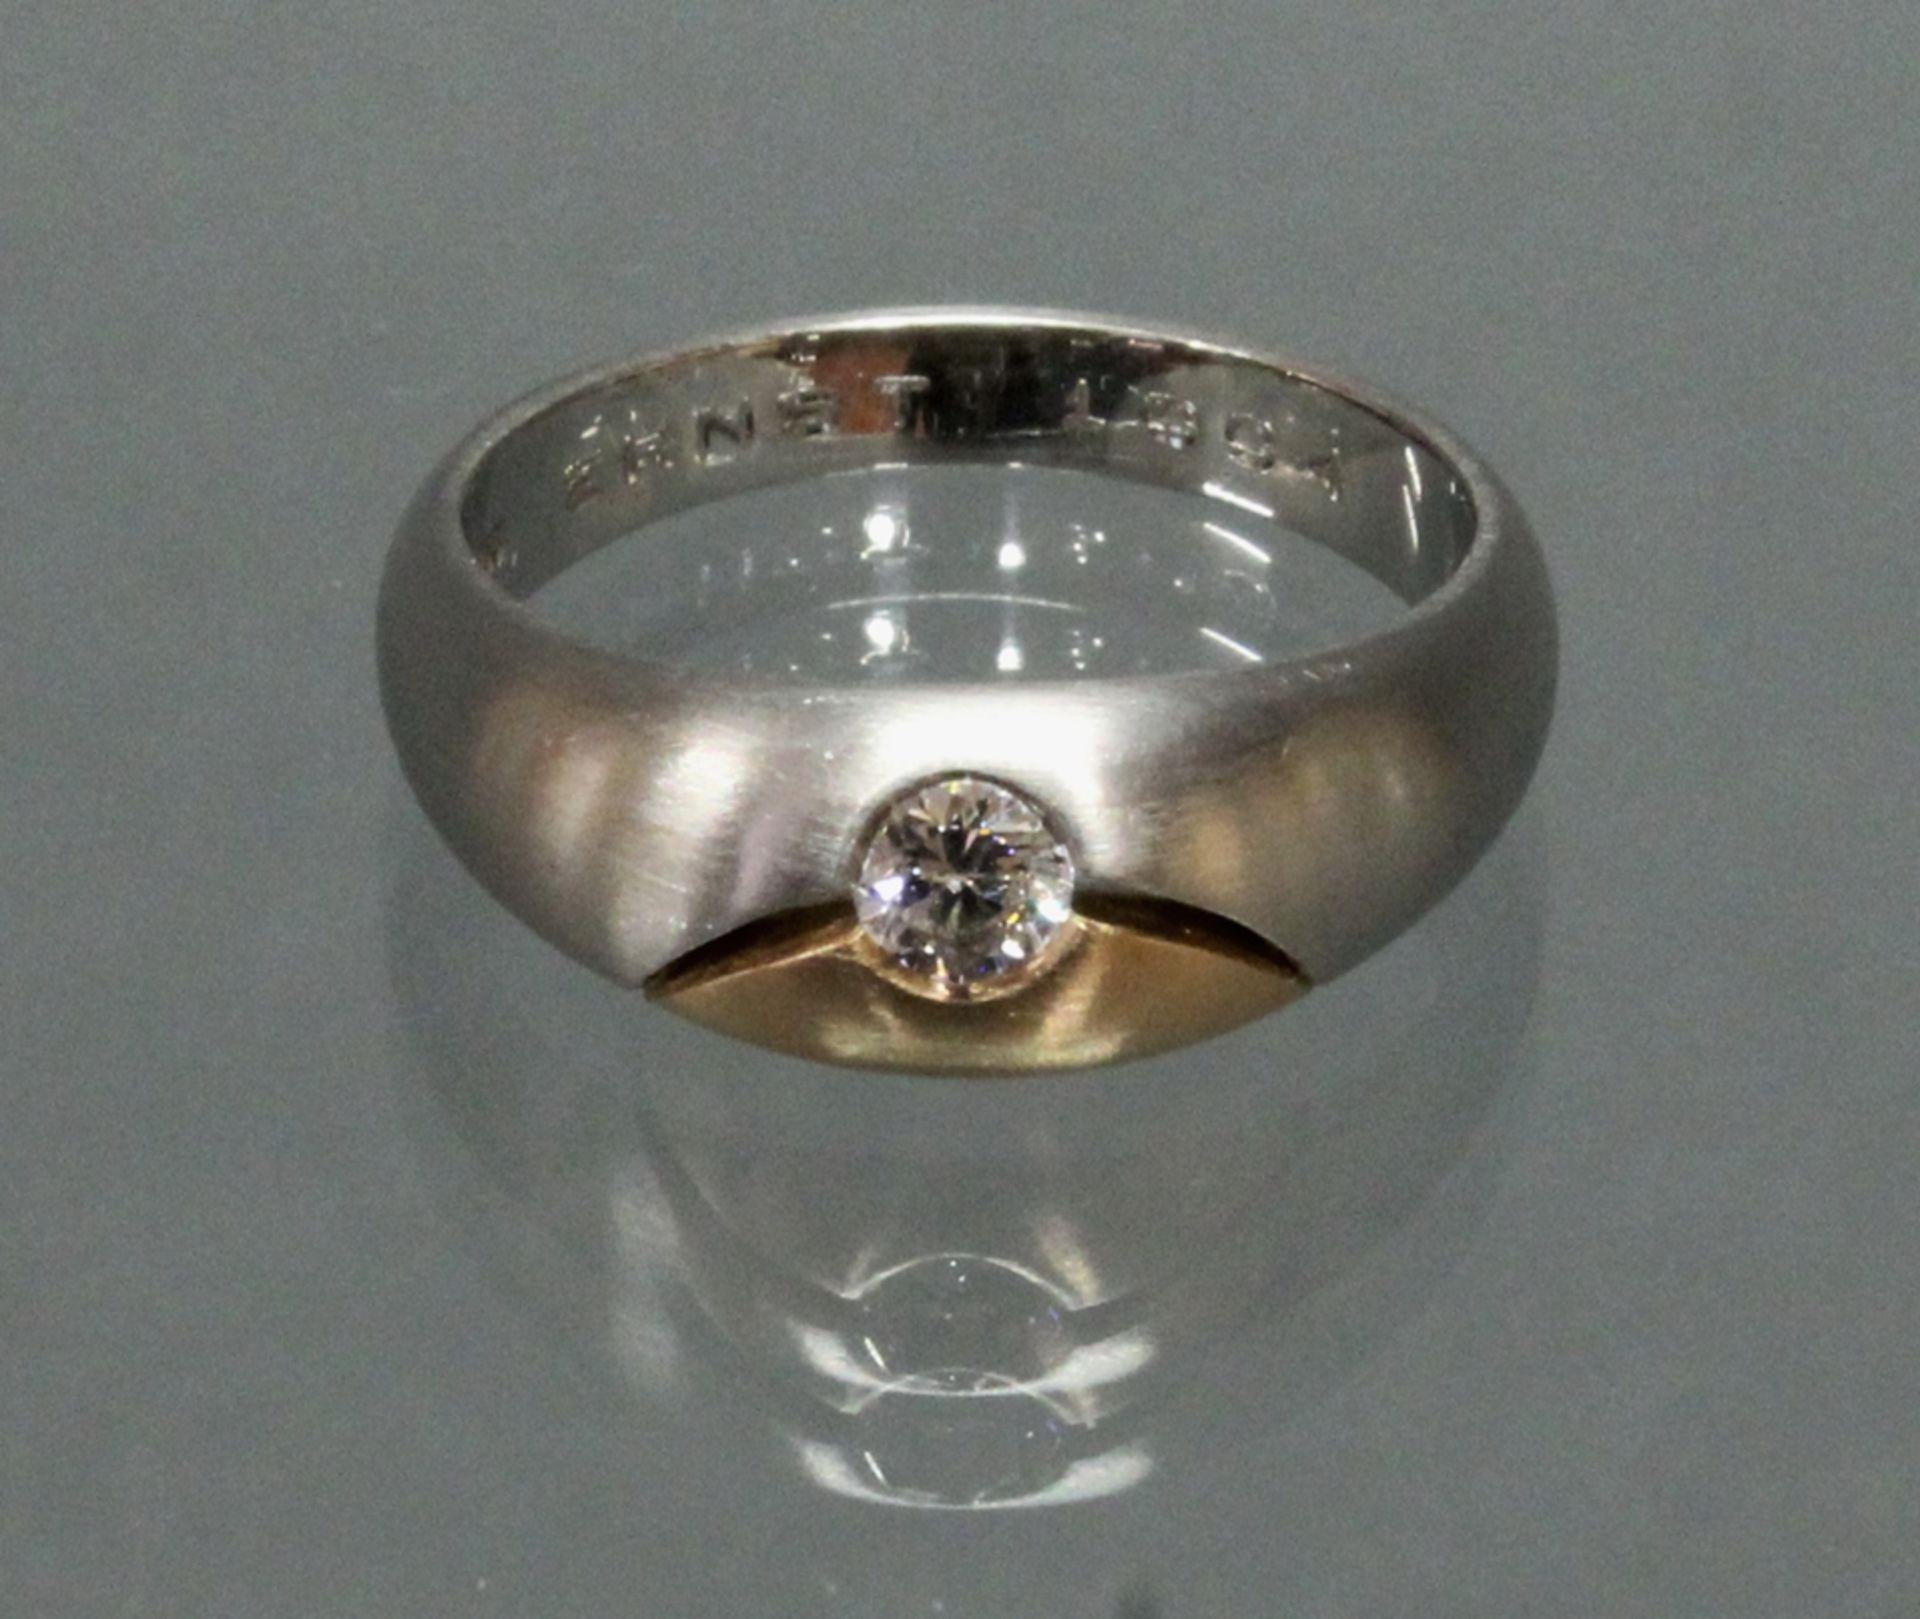 Ring, Platin 960/Roségold 750, 1 Brillant ca. 0.20 ct., etwa fw/vsi, innen Widmung, 10 g, RM 19